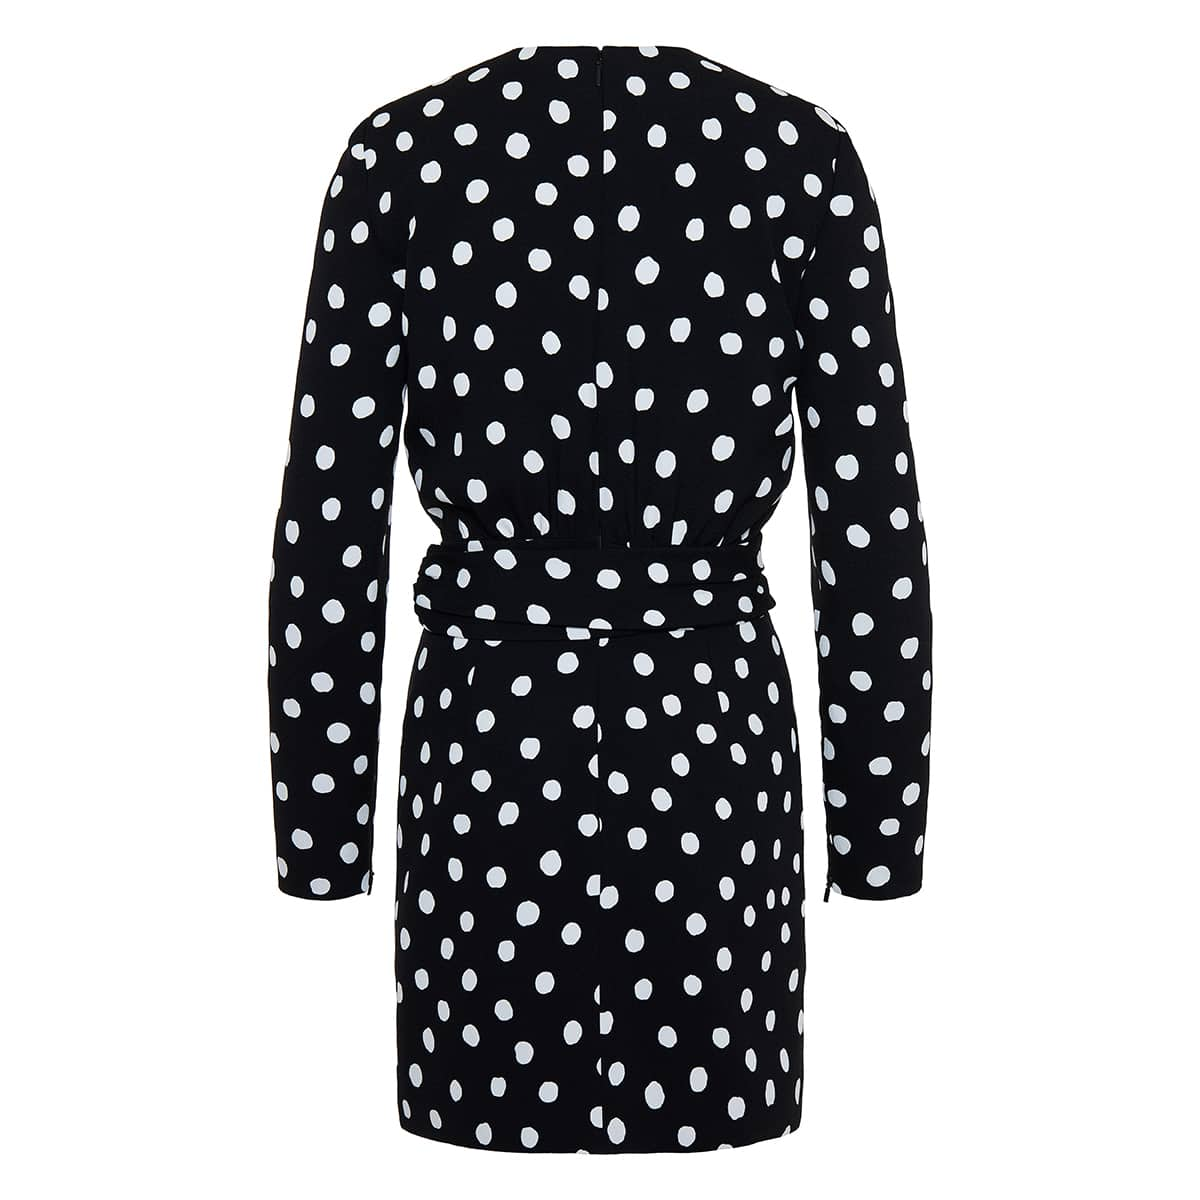 Polka-dot knotted mini dress